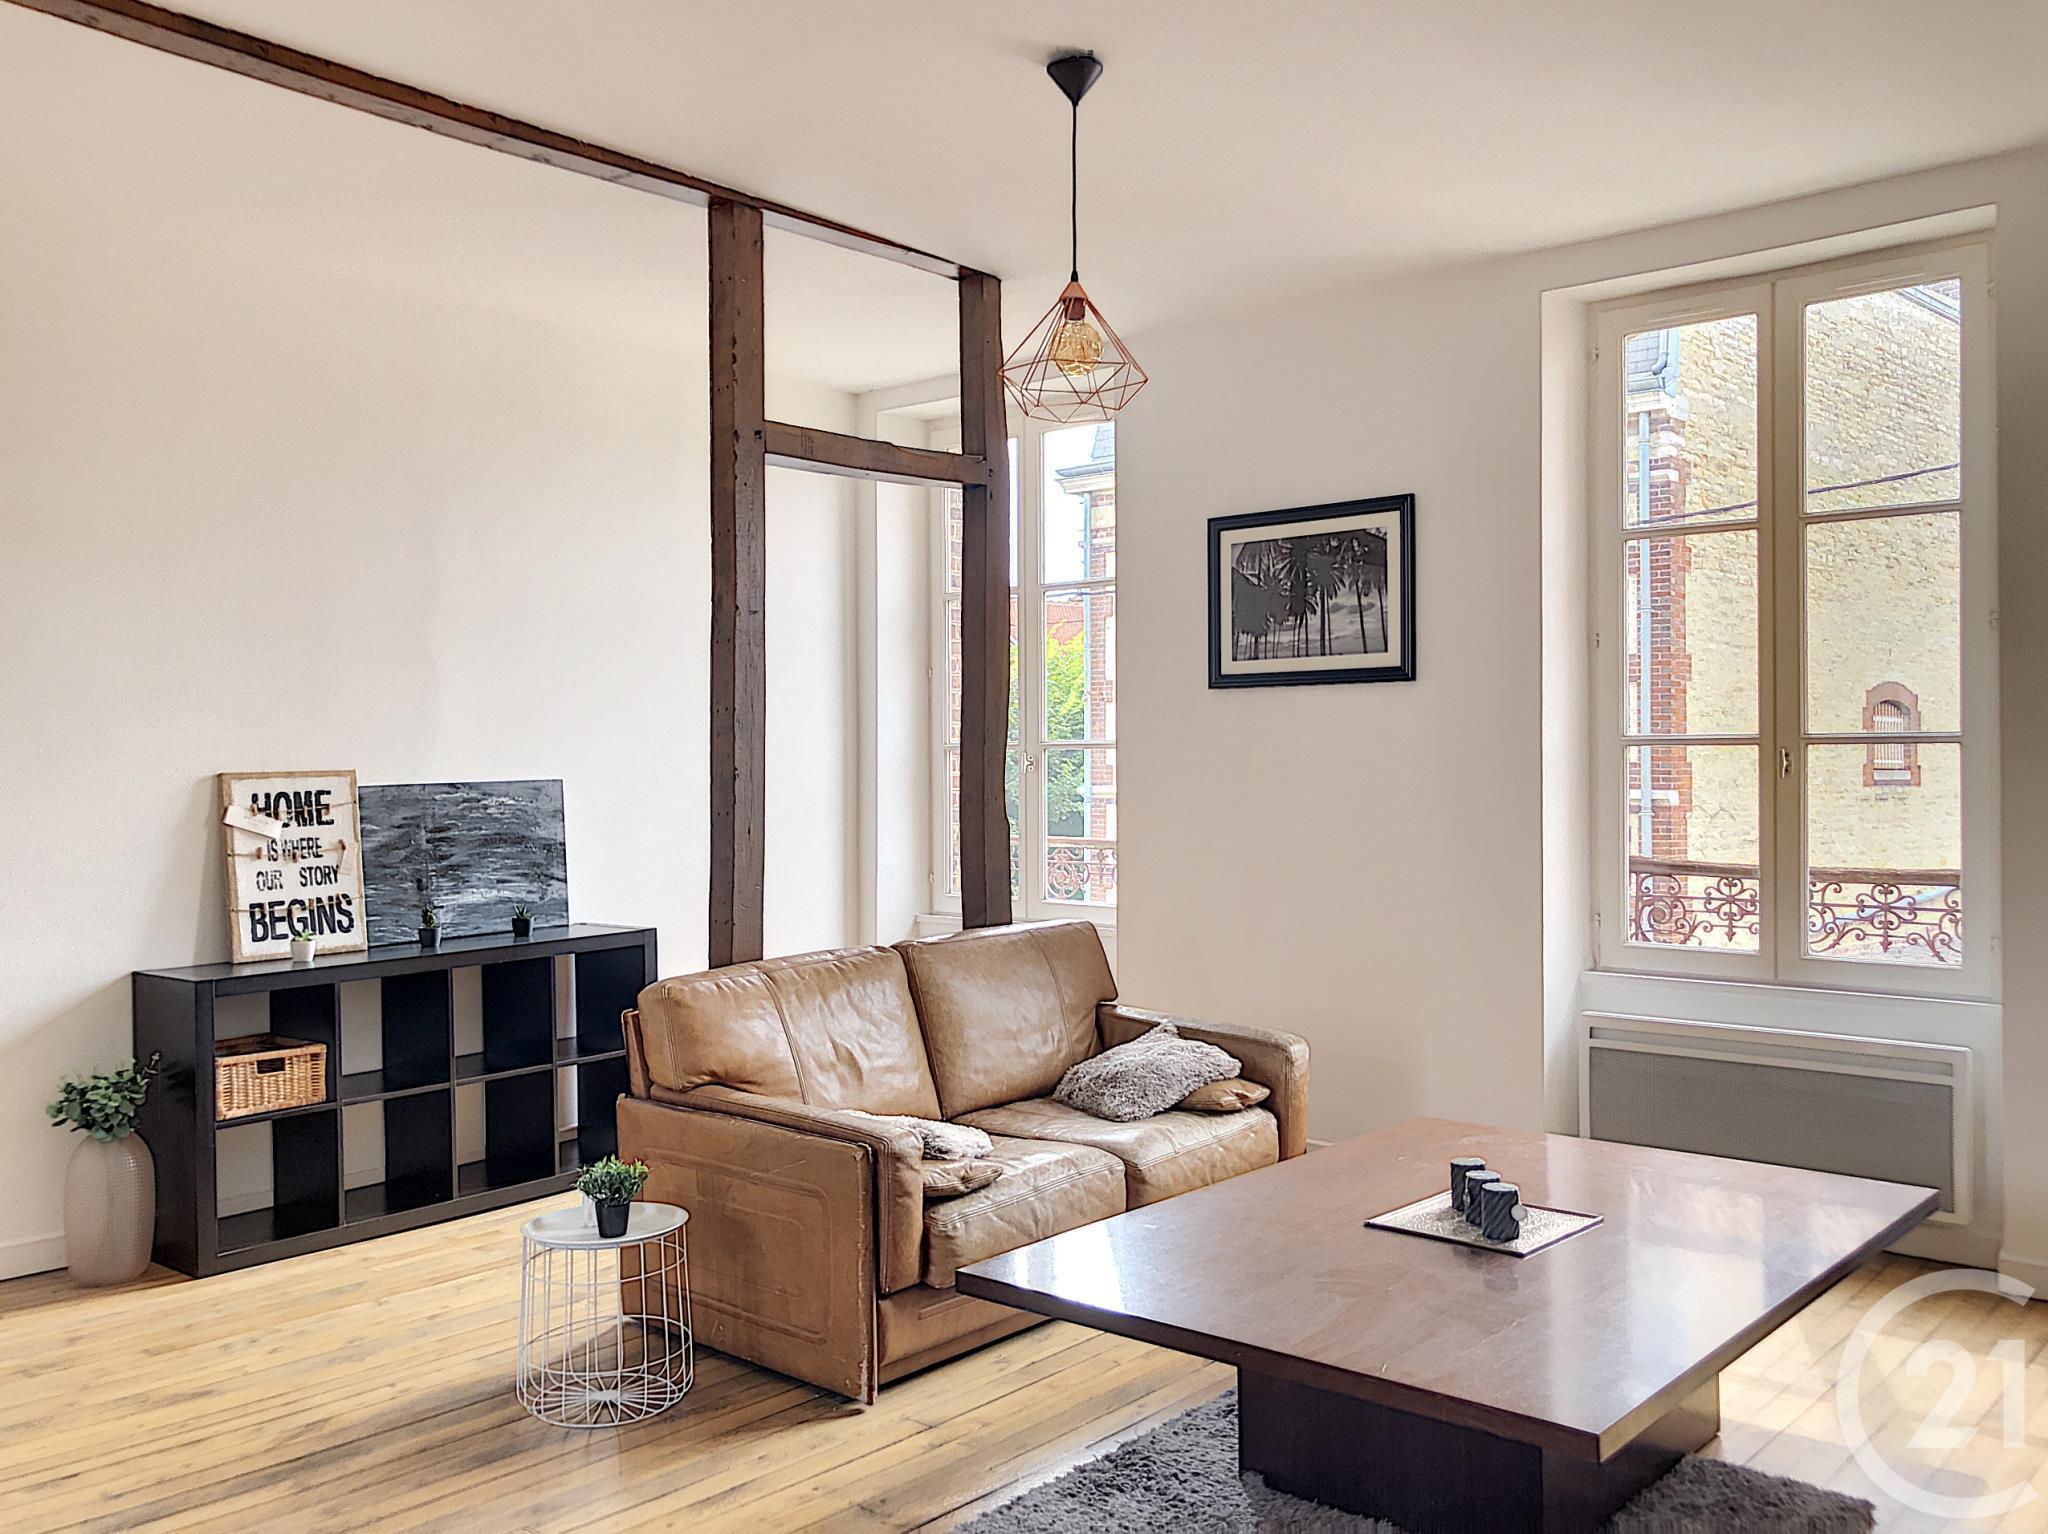 appartement f4 louer 4 pi ces 83 m2 ste savine. Black Bedroom Furniture Sets. Home Design Ideas